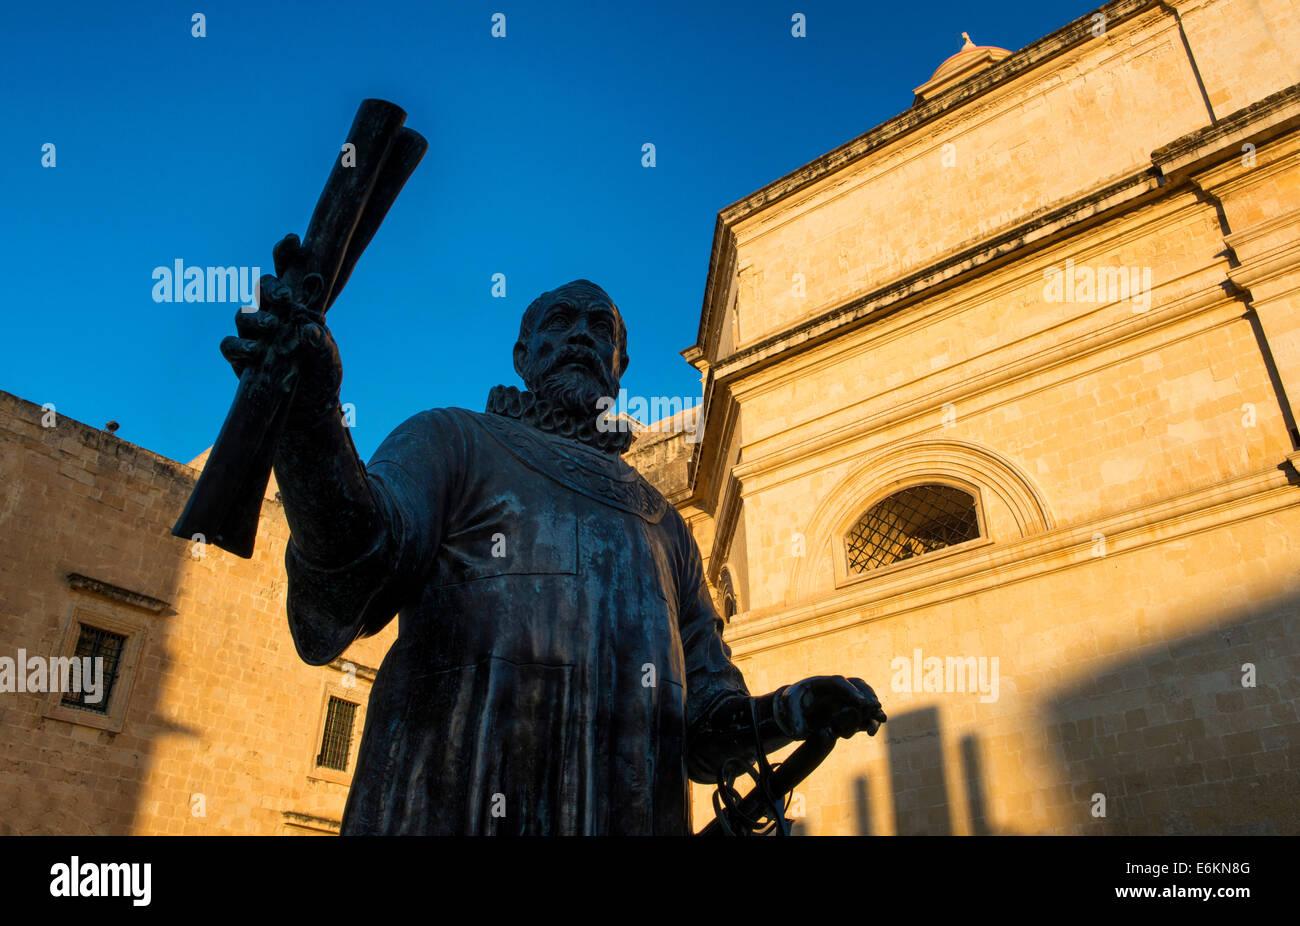 Jean Parisot De Valette Statue, Valletta, Malta - Stock Image